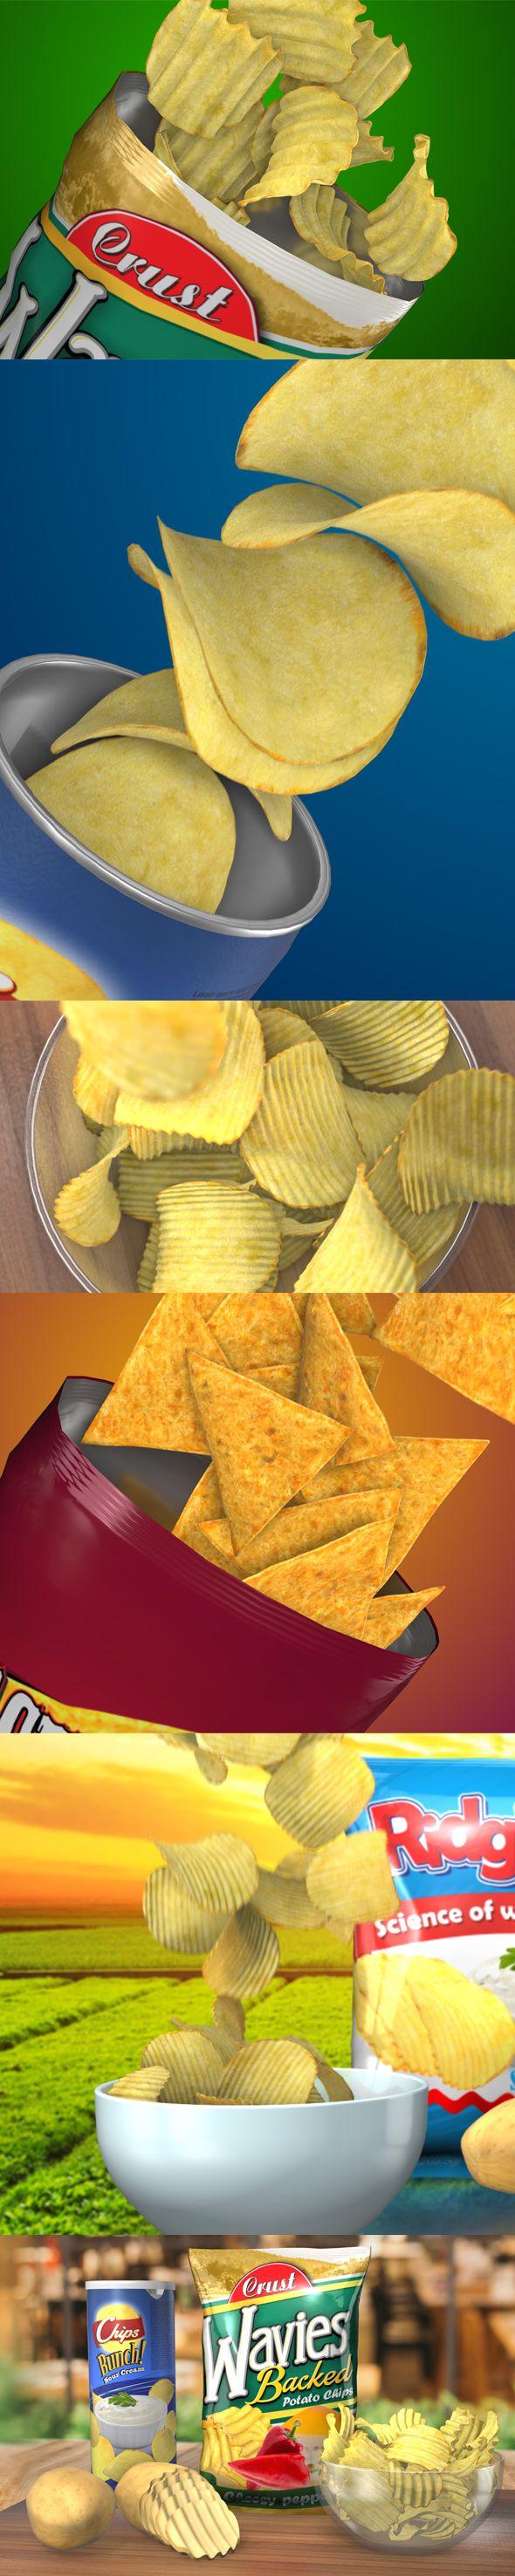 Chips samples